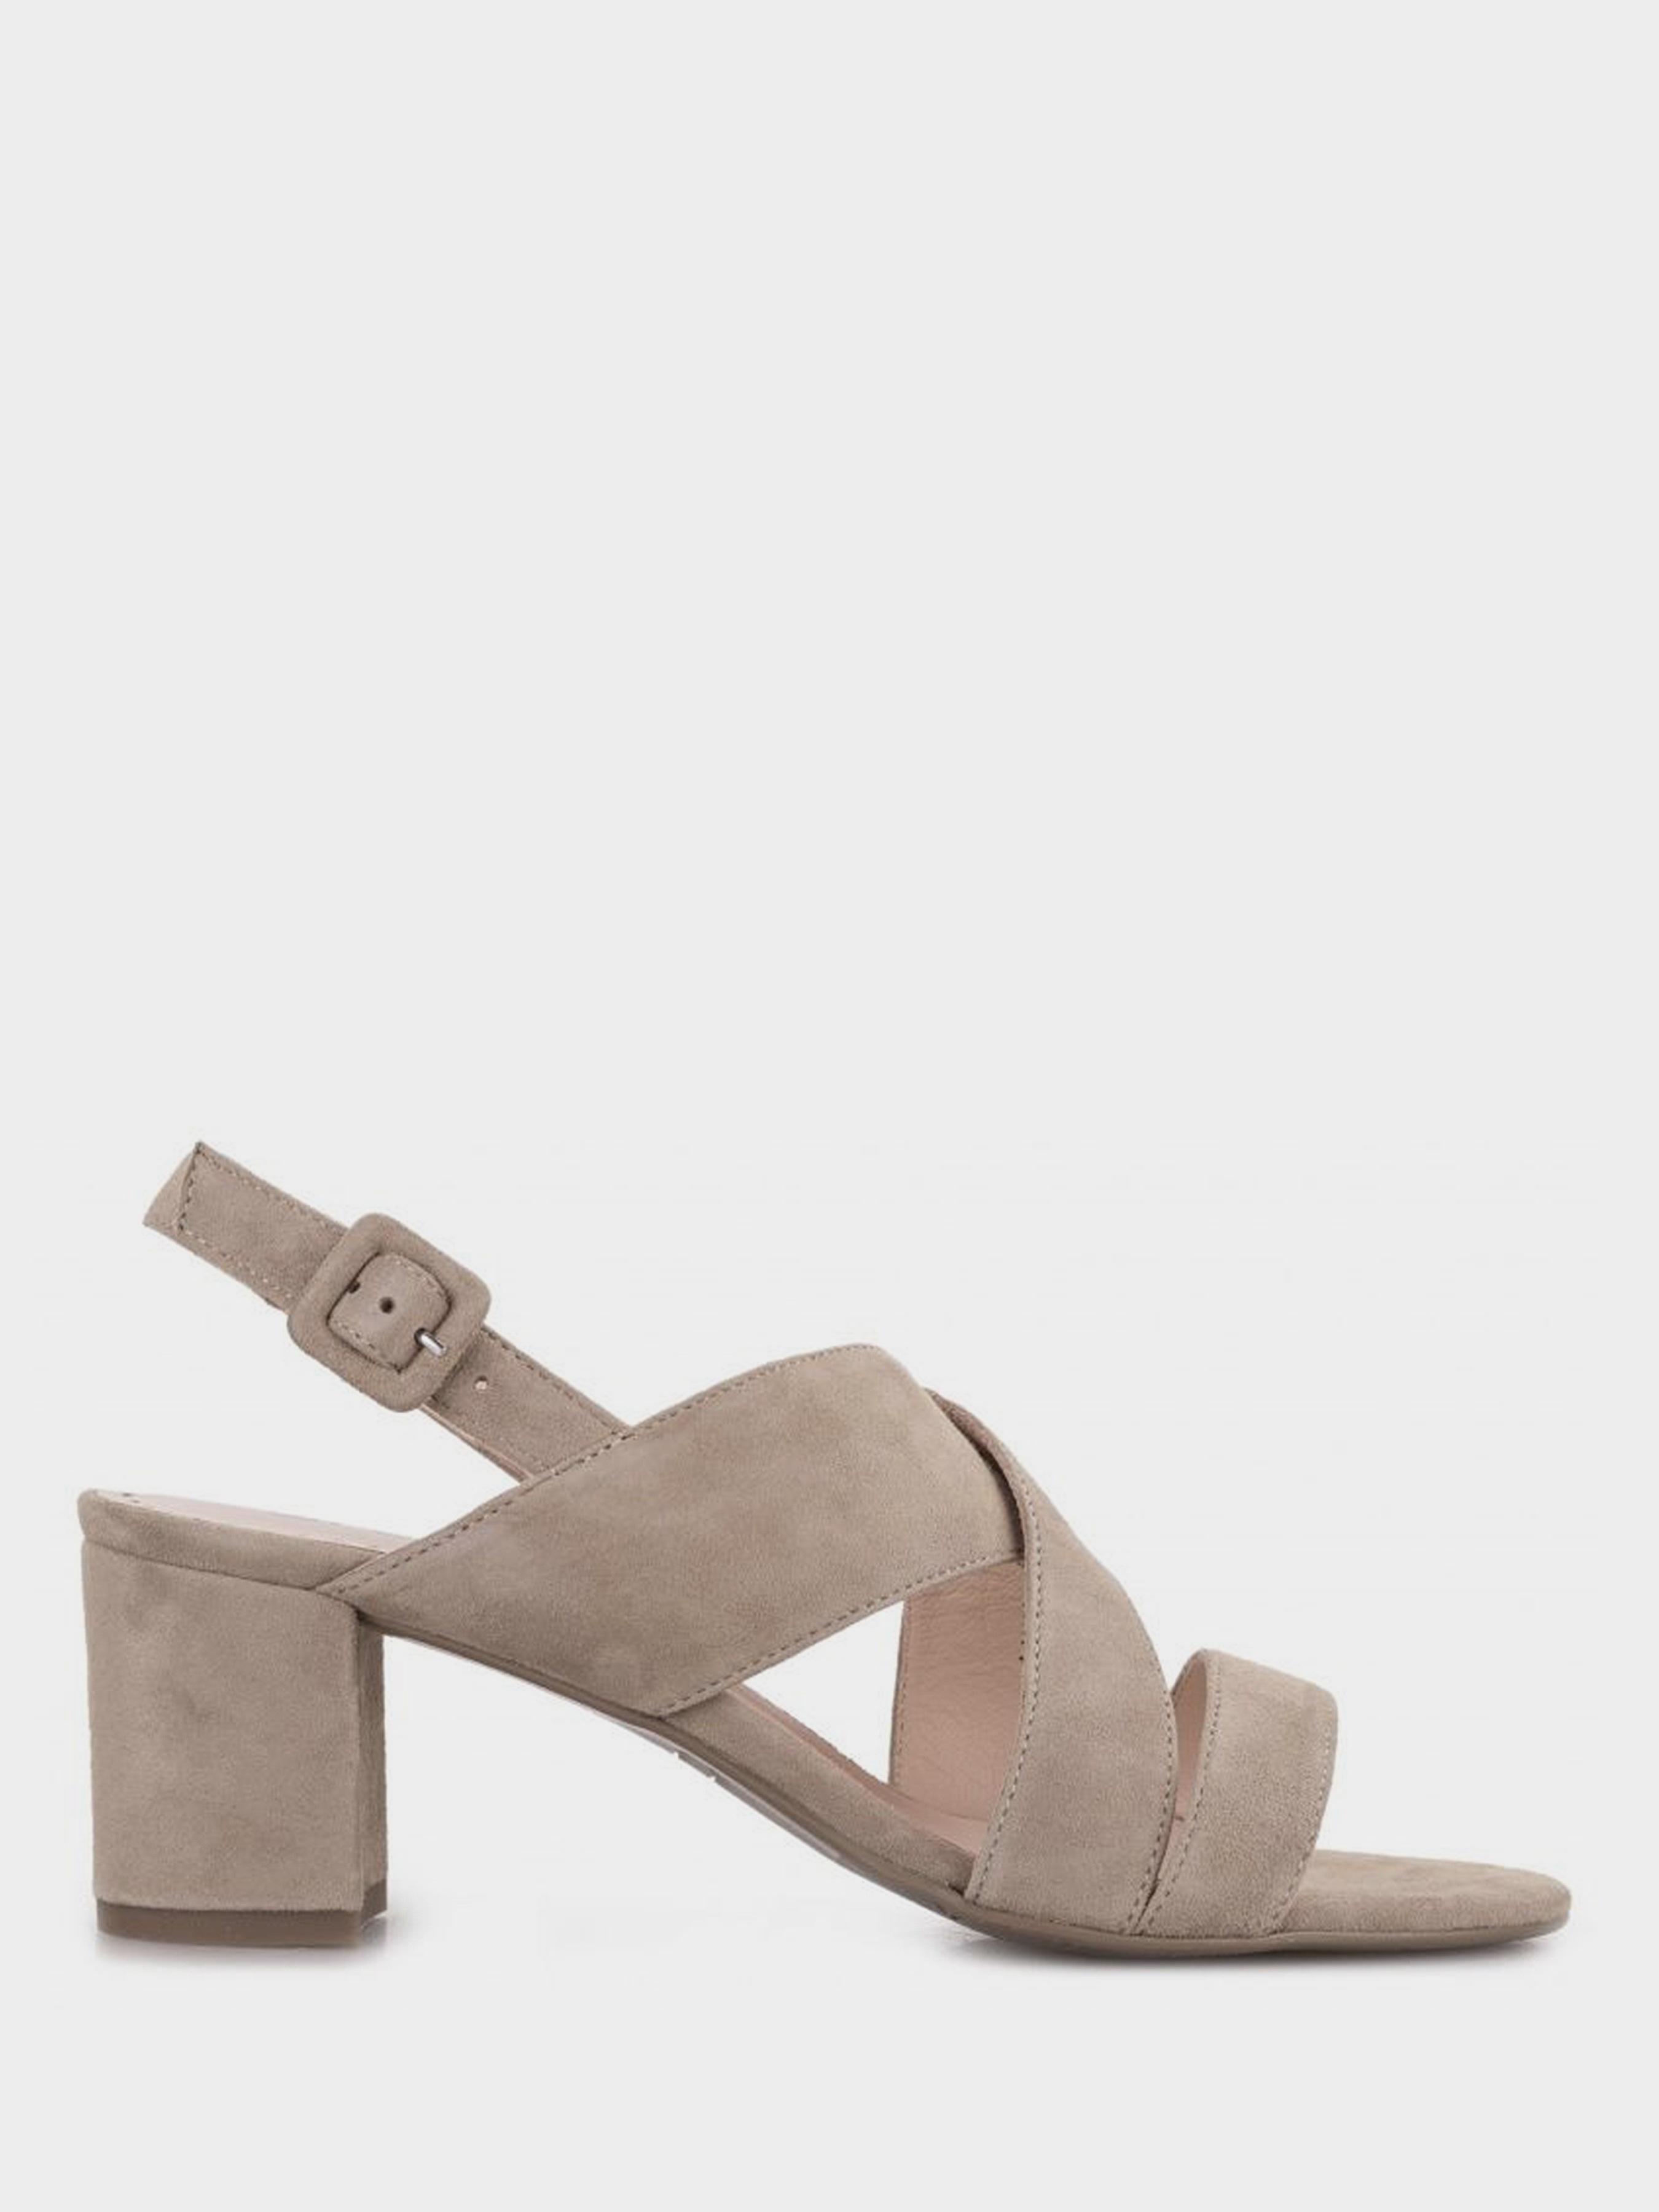 Босоножки для женщин Braska RSM босоніжки жін. (36-41) 8Y12 размерная сетка обуви, 2017